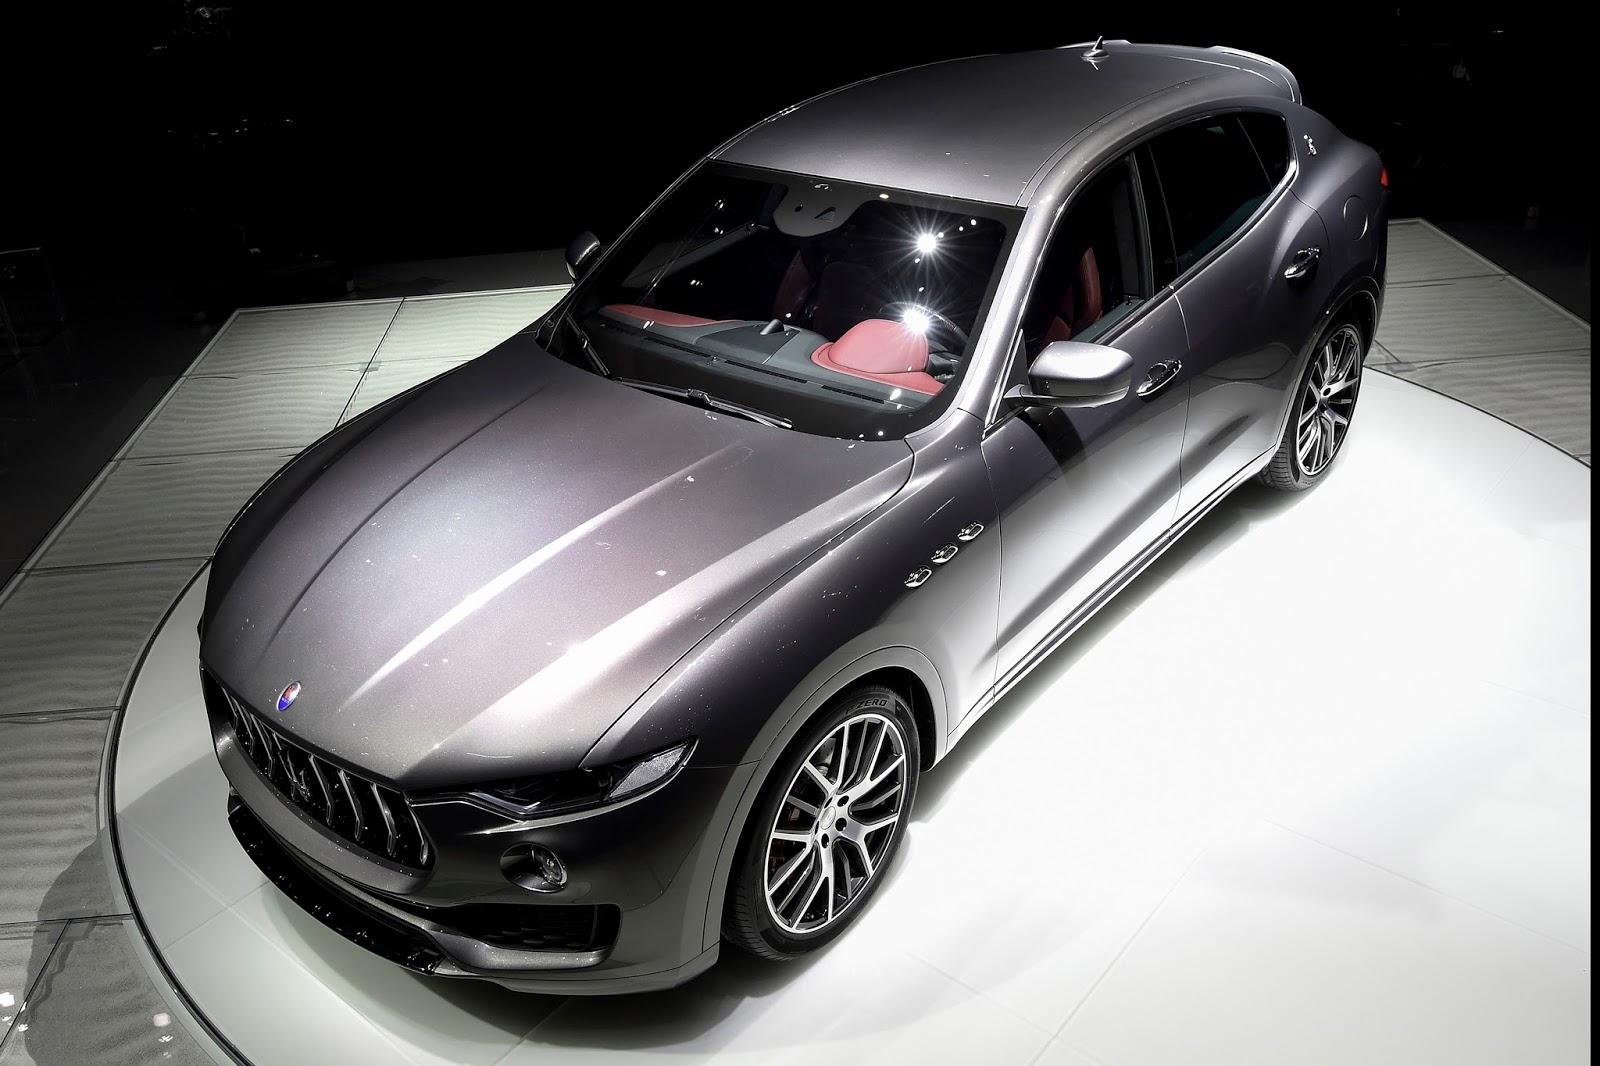 56d5807f6f2cf Τα πάντα για το πρώτο SUV της Maserati autoshow, Maserati, Maserati Ghibli, Maserati Ghibli S, Maserati Ghibli S Q4, Maserati GranTurismo, Maserati Levante, Maserati Levante S, Maserati Quattroporte, zblog